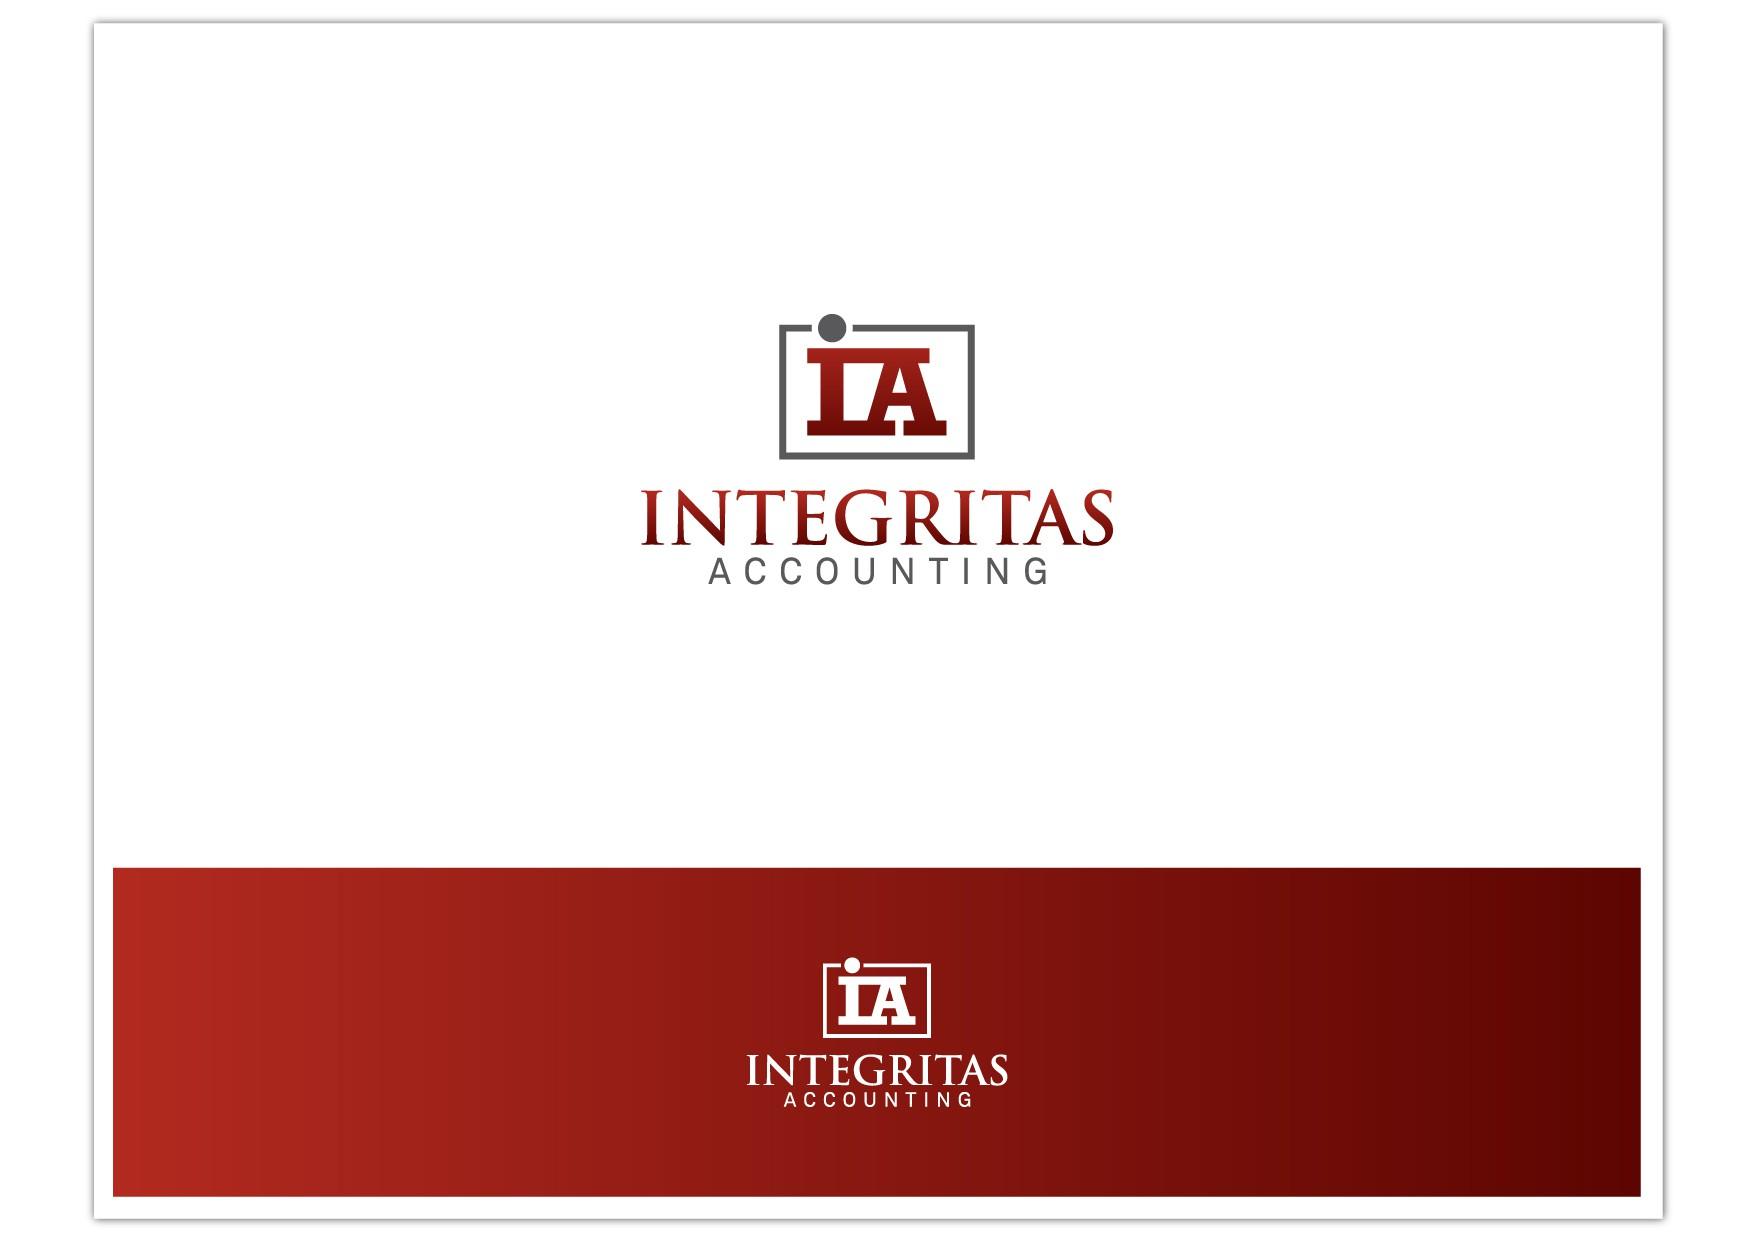 Integritas Accounting needs a new logo